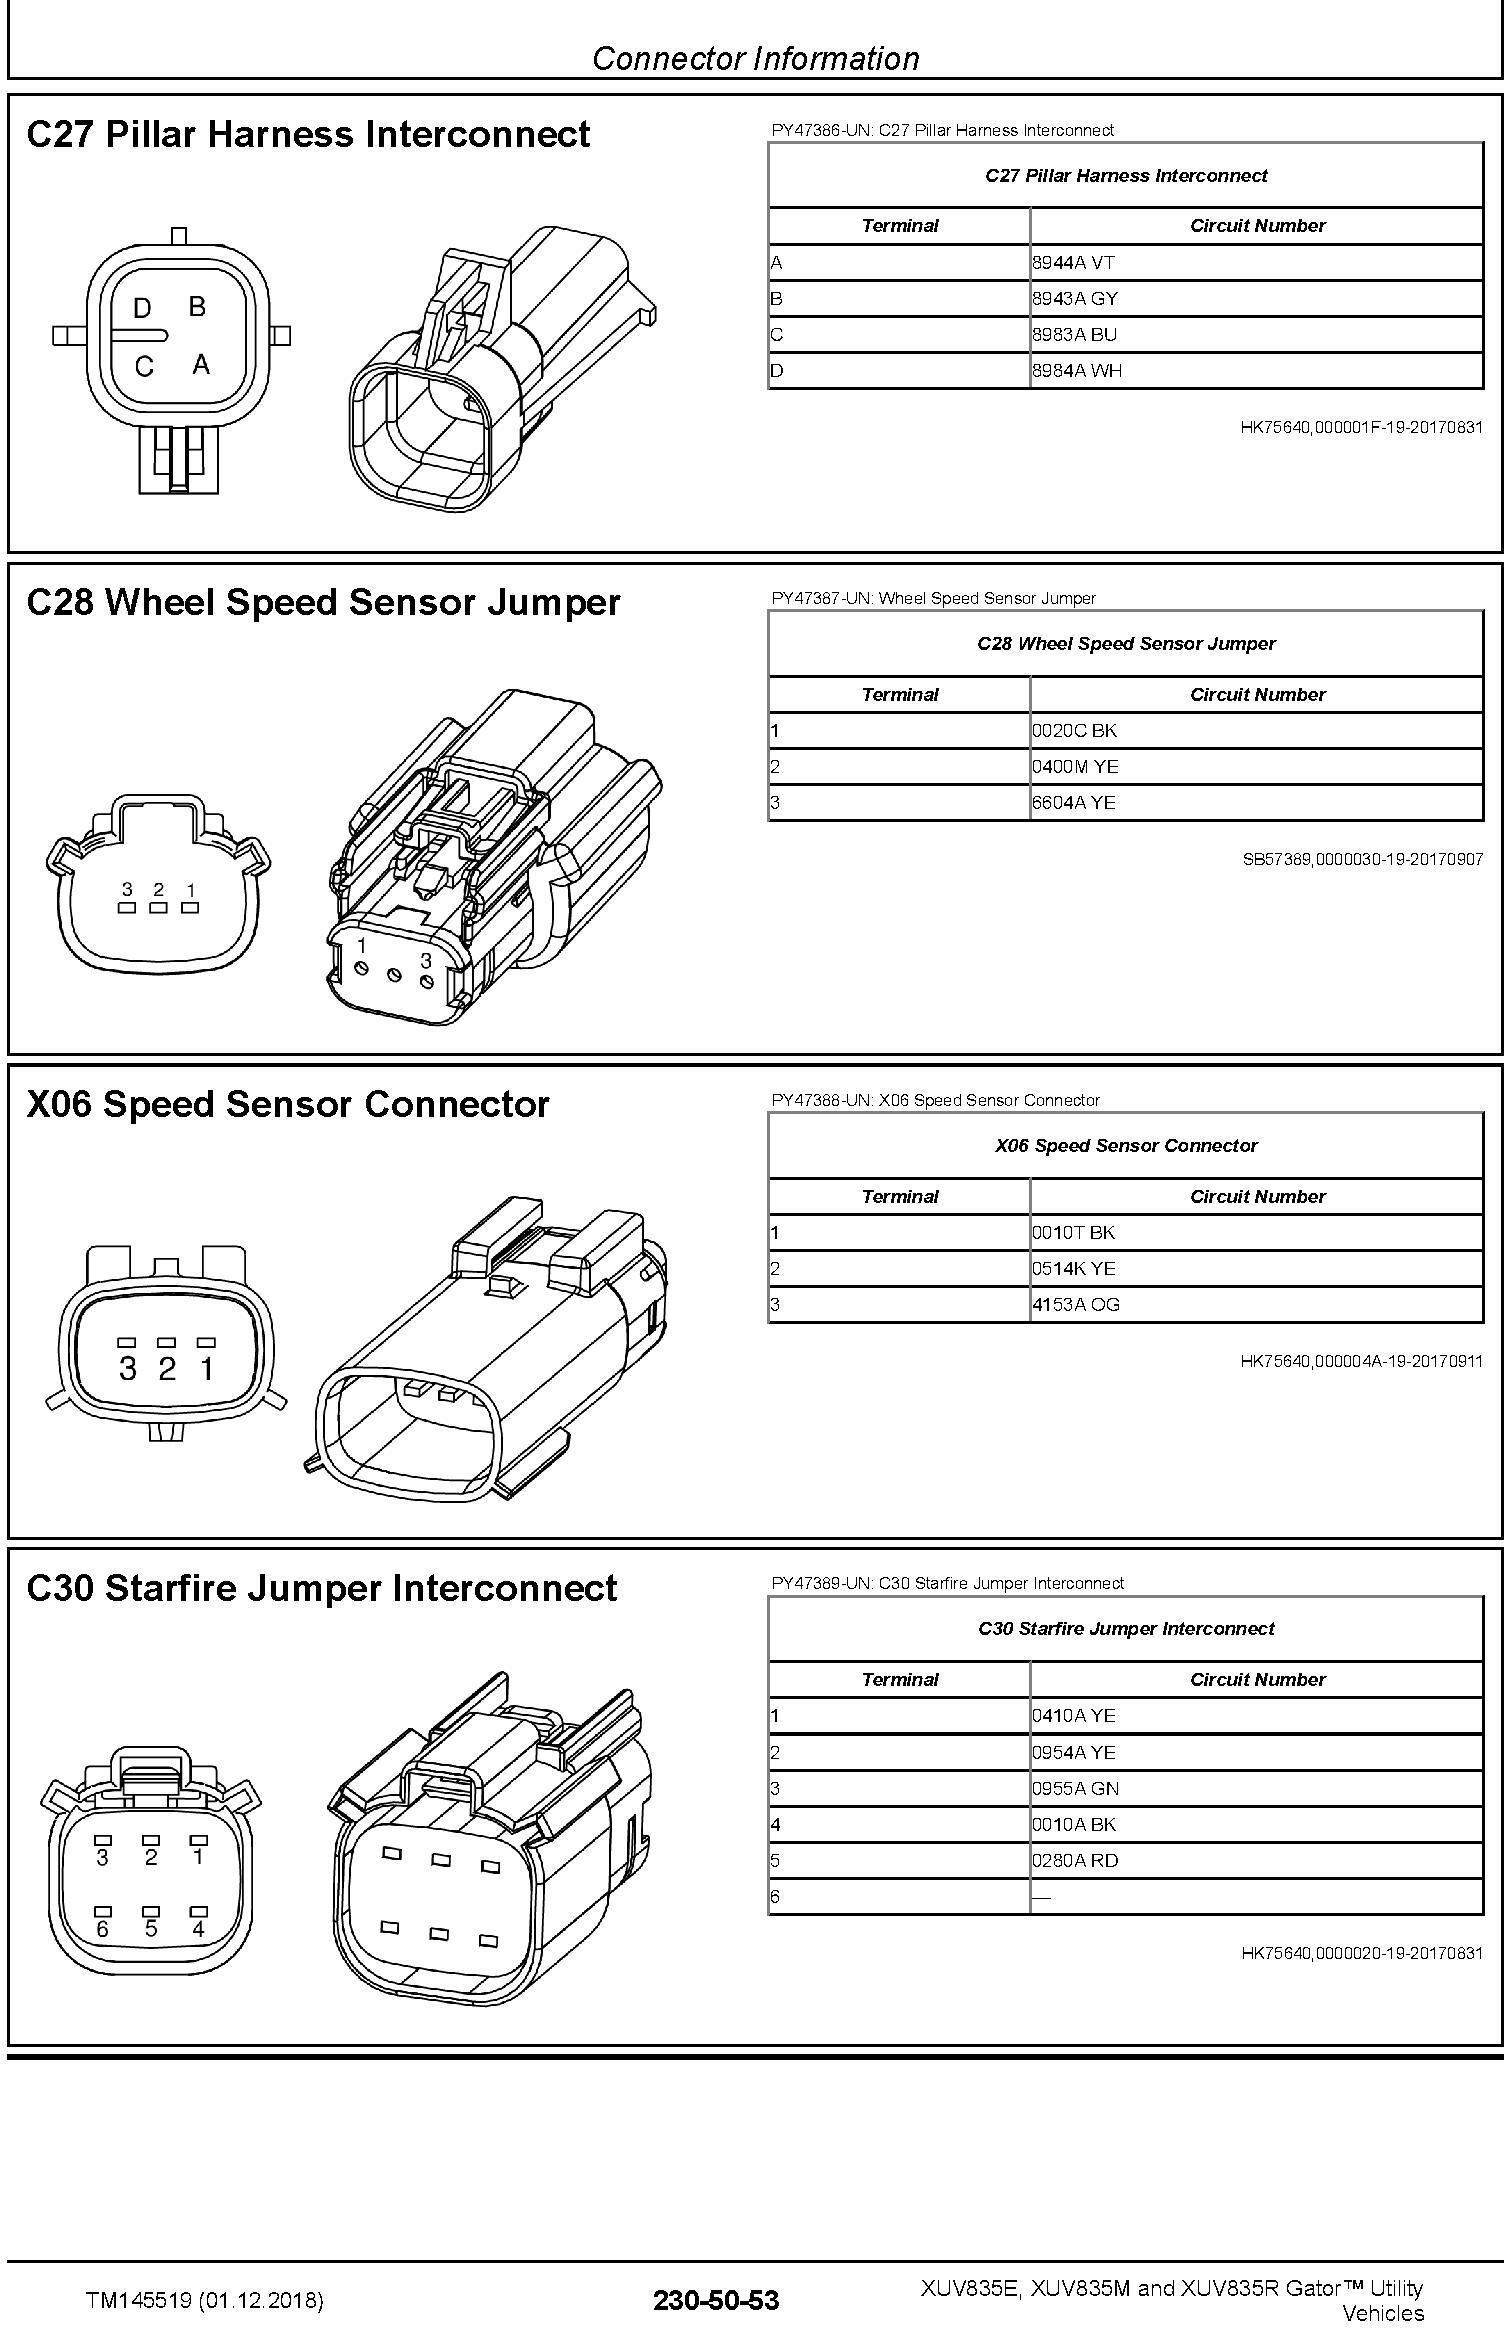 John Deere XUV835E, XUV835M, XUV835R Gator Utility Vehicles (SN.010001-) Technical Manual (TM145519) - 1